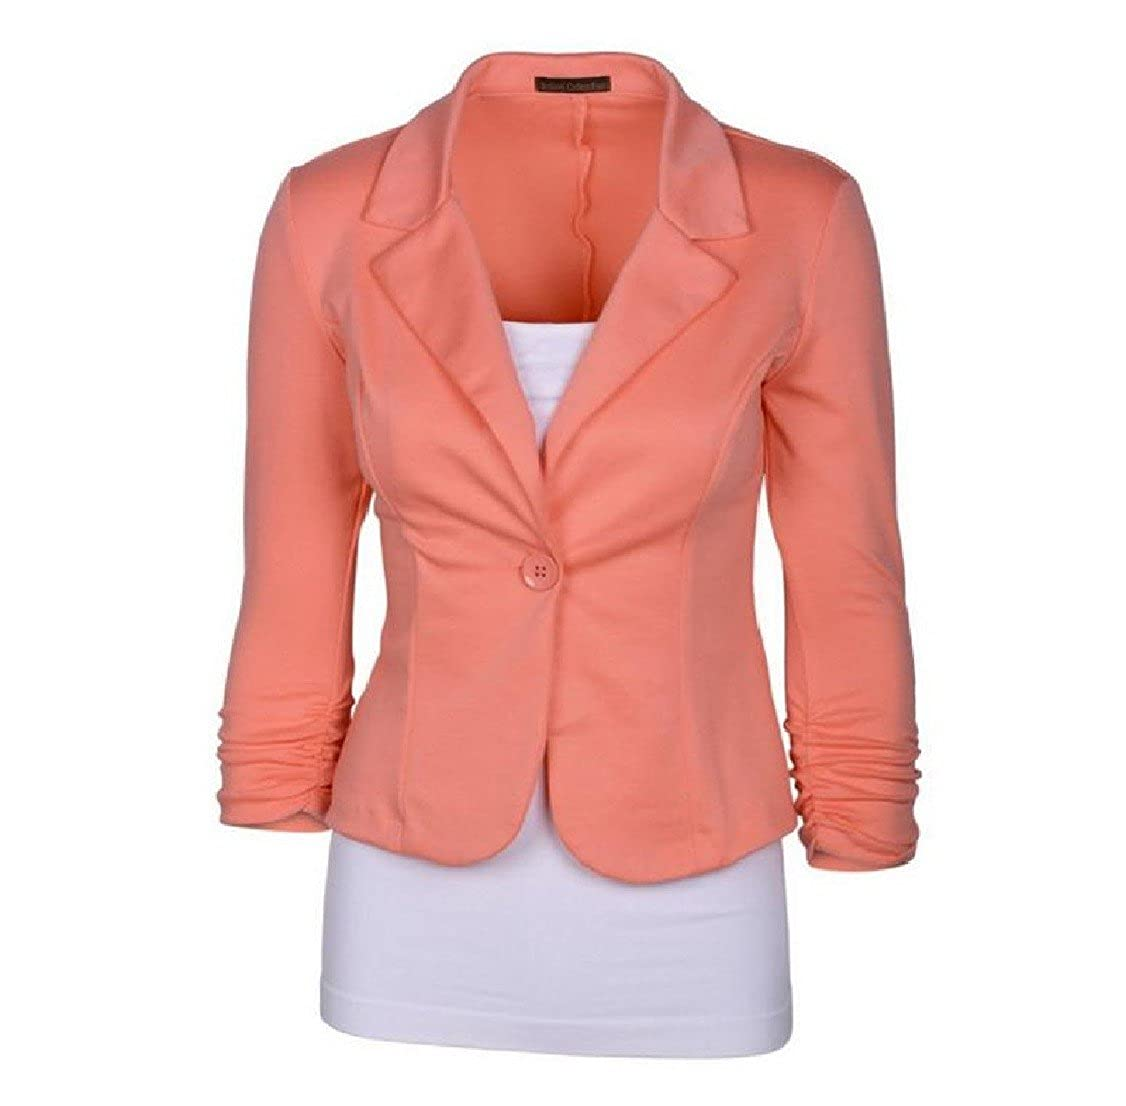 GodeyesWomen Godeyes Women V Neck Short Novelty Pure Color 1 Button Coats Suit Raincoat